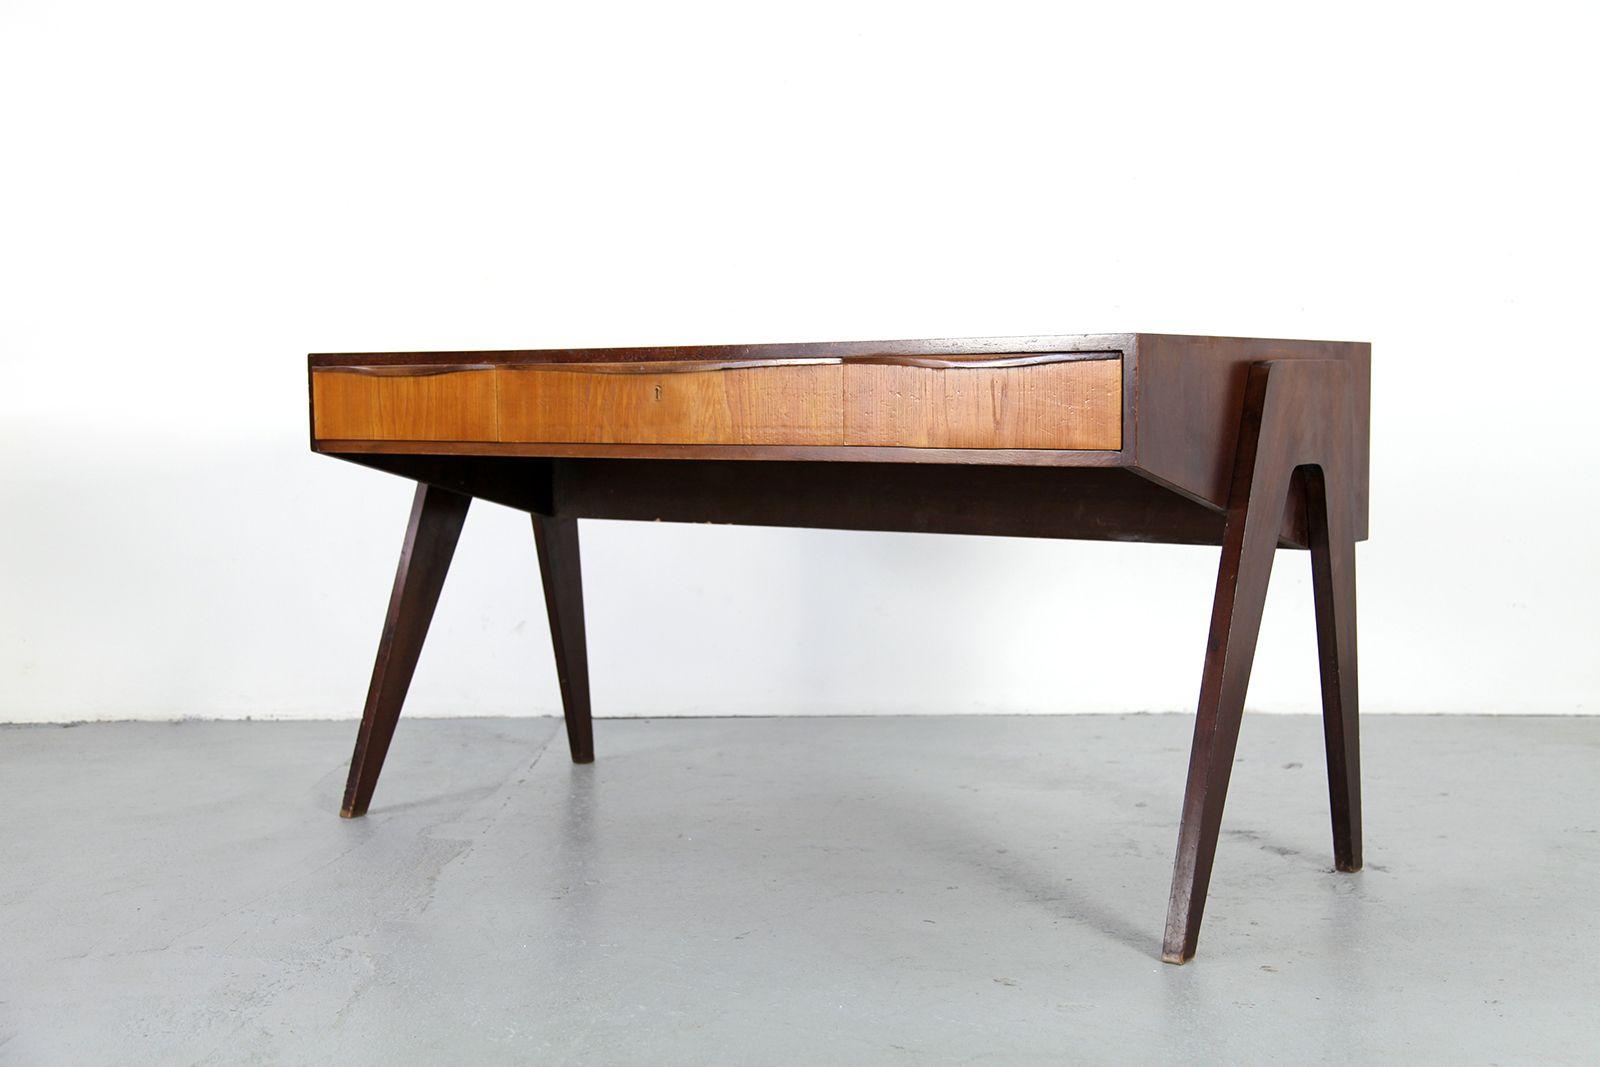 mid century walnut desk from behr m bel 1950s for sale at pamono. Black Bedroom Furniture Sets. Home Design Ideas